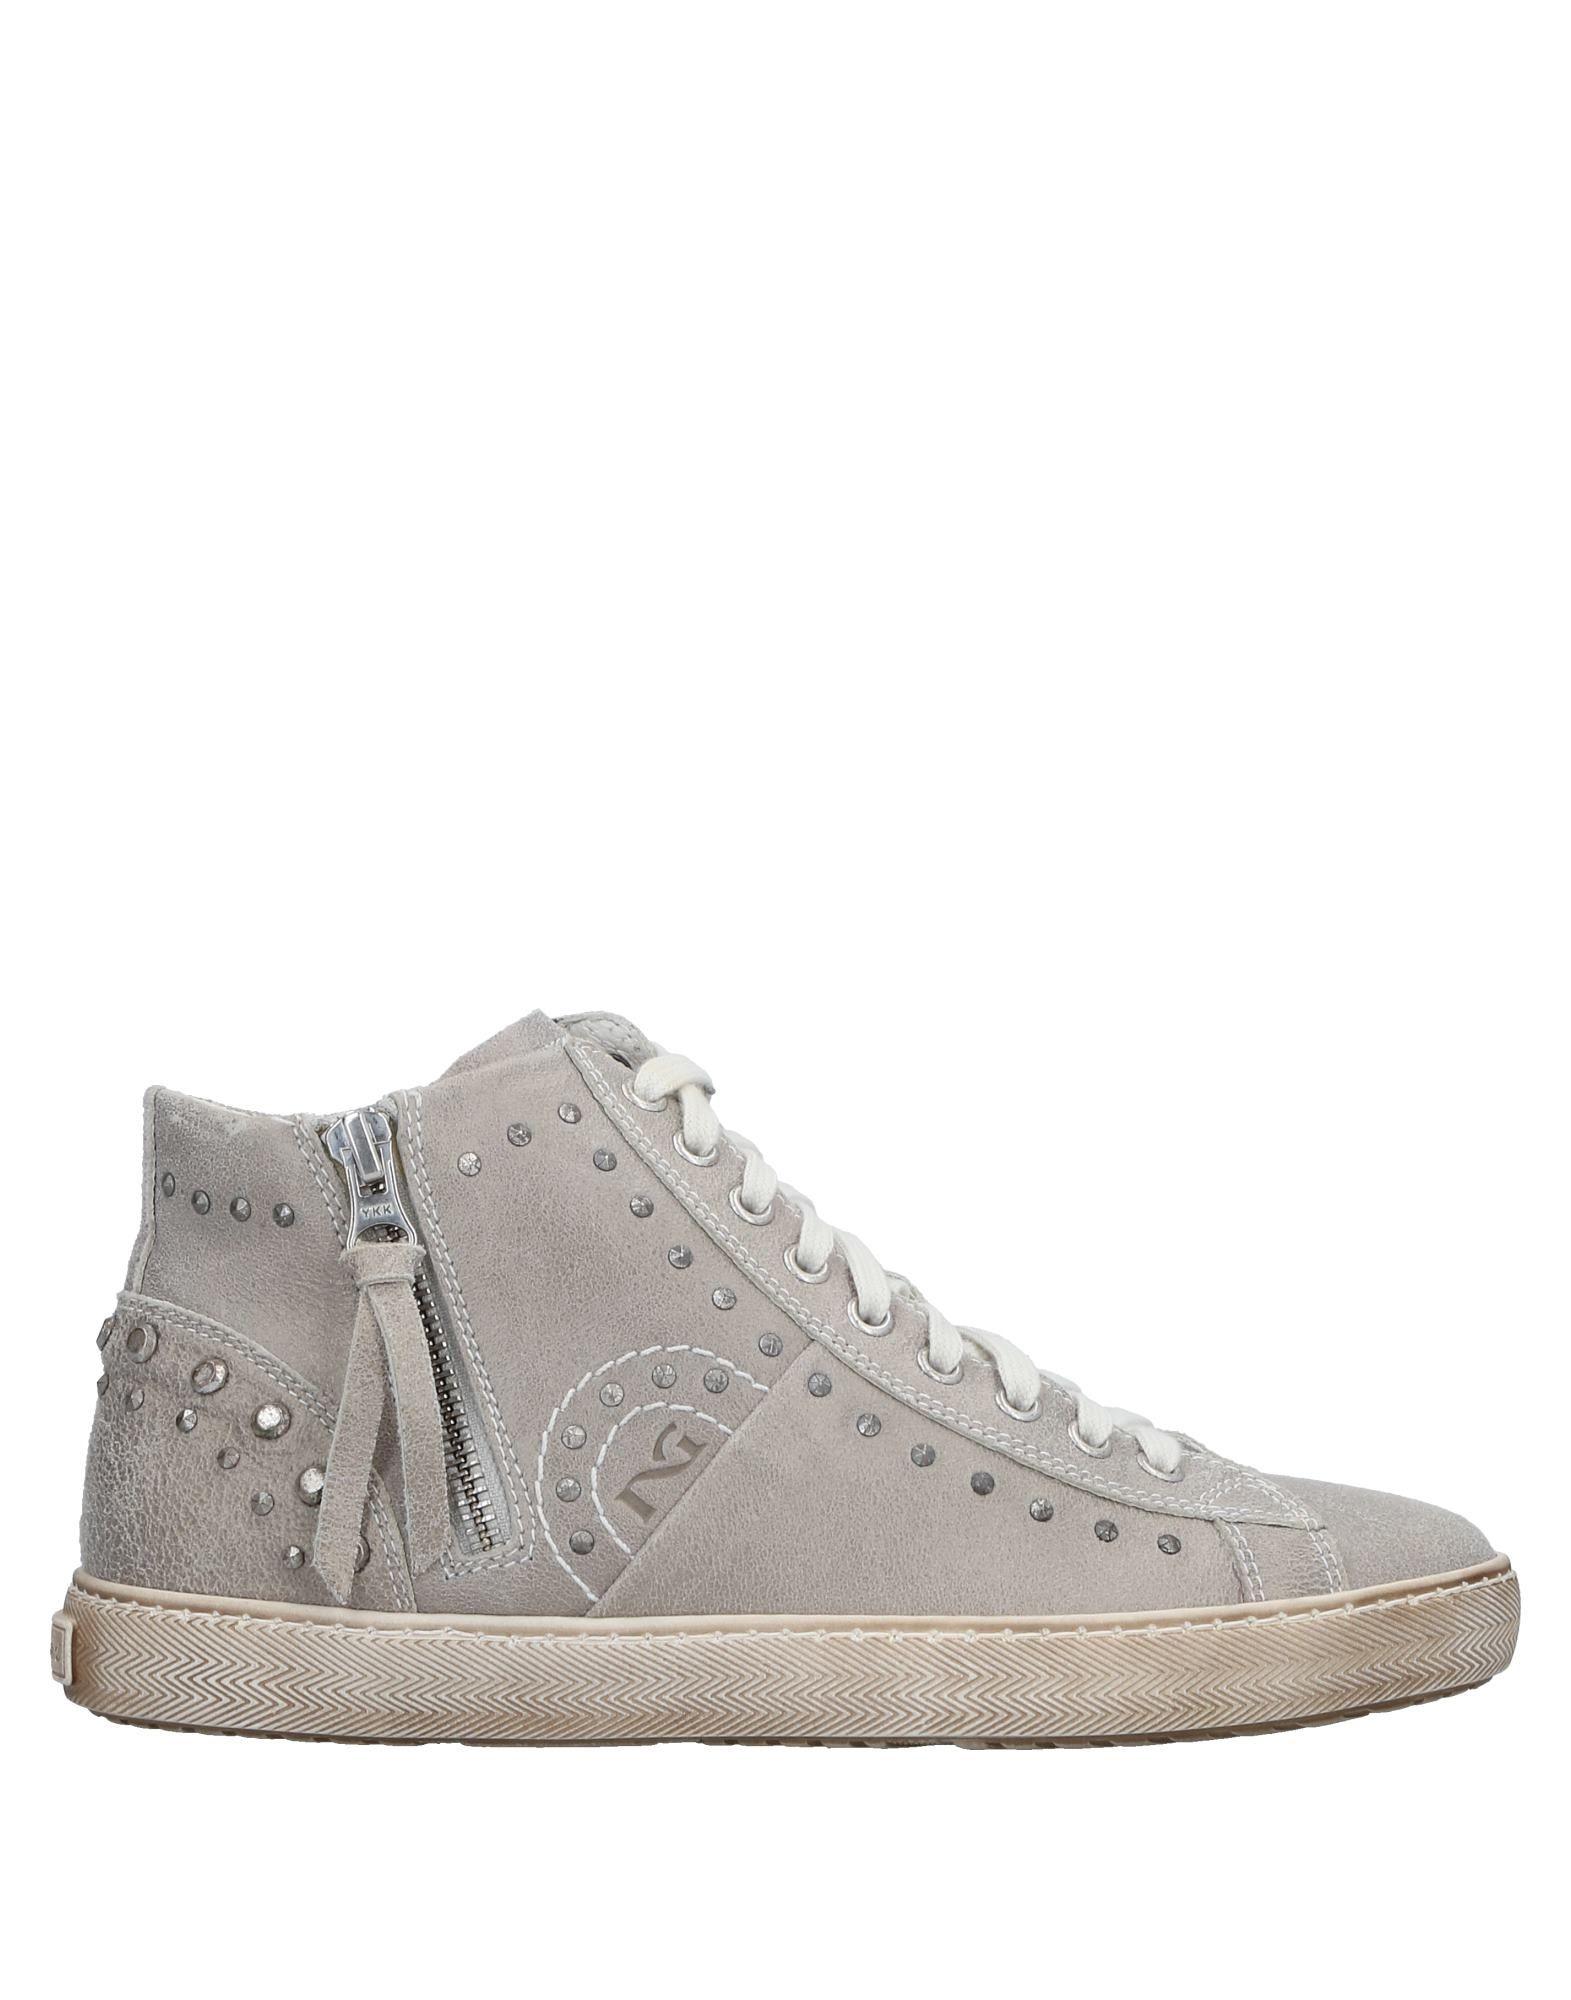 Nero Giardini 11531450TN Sneakers Damen  11531450TN Giardini Gute Qualität beliebte Schuhe 7e27de